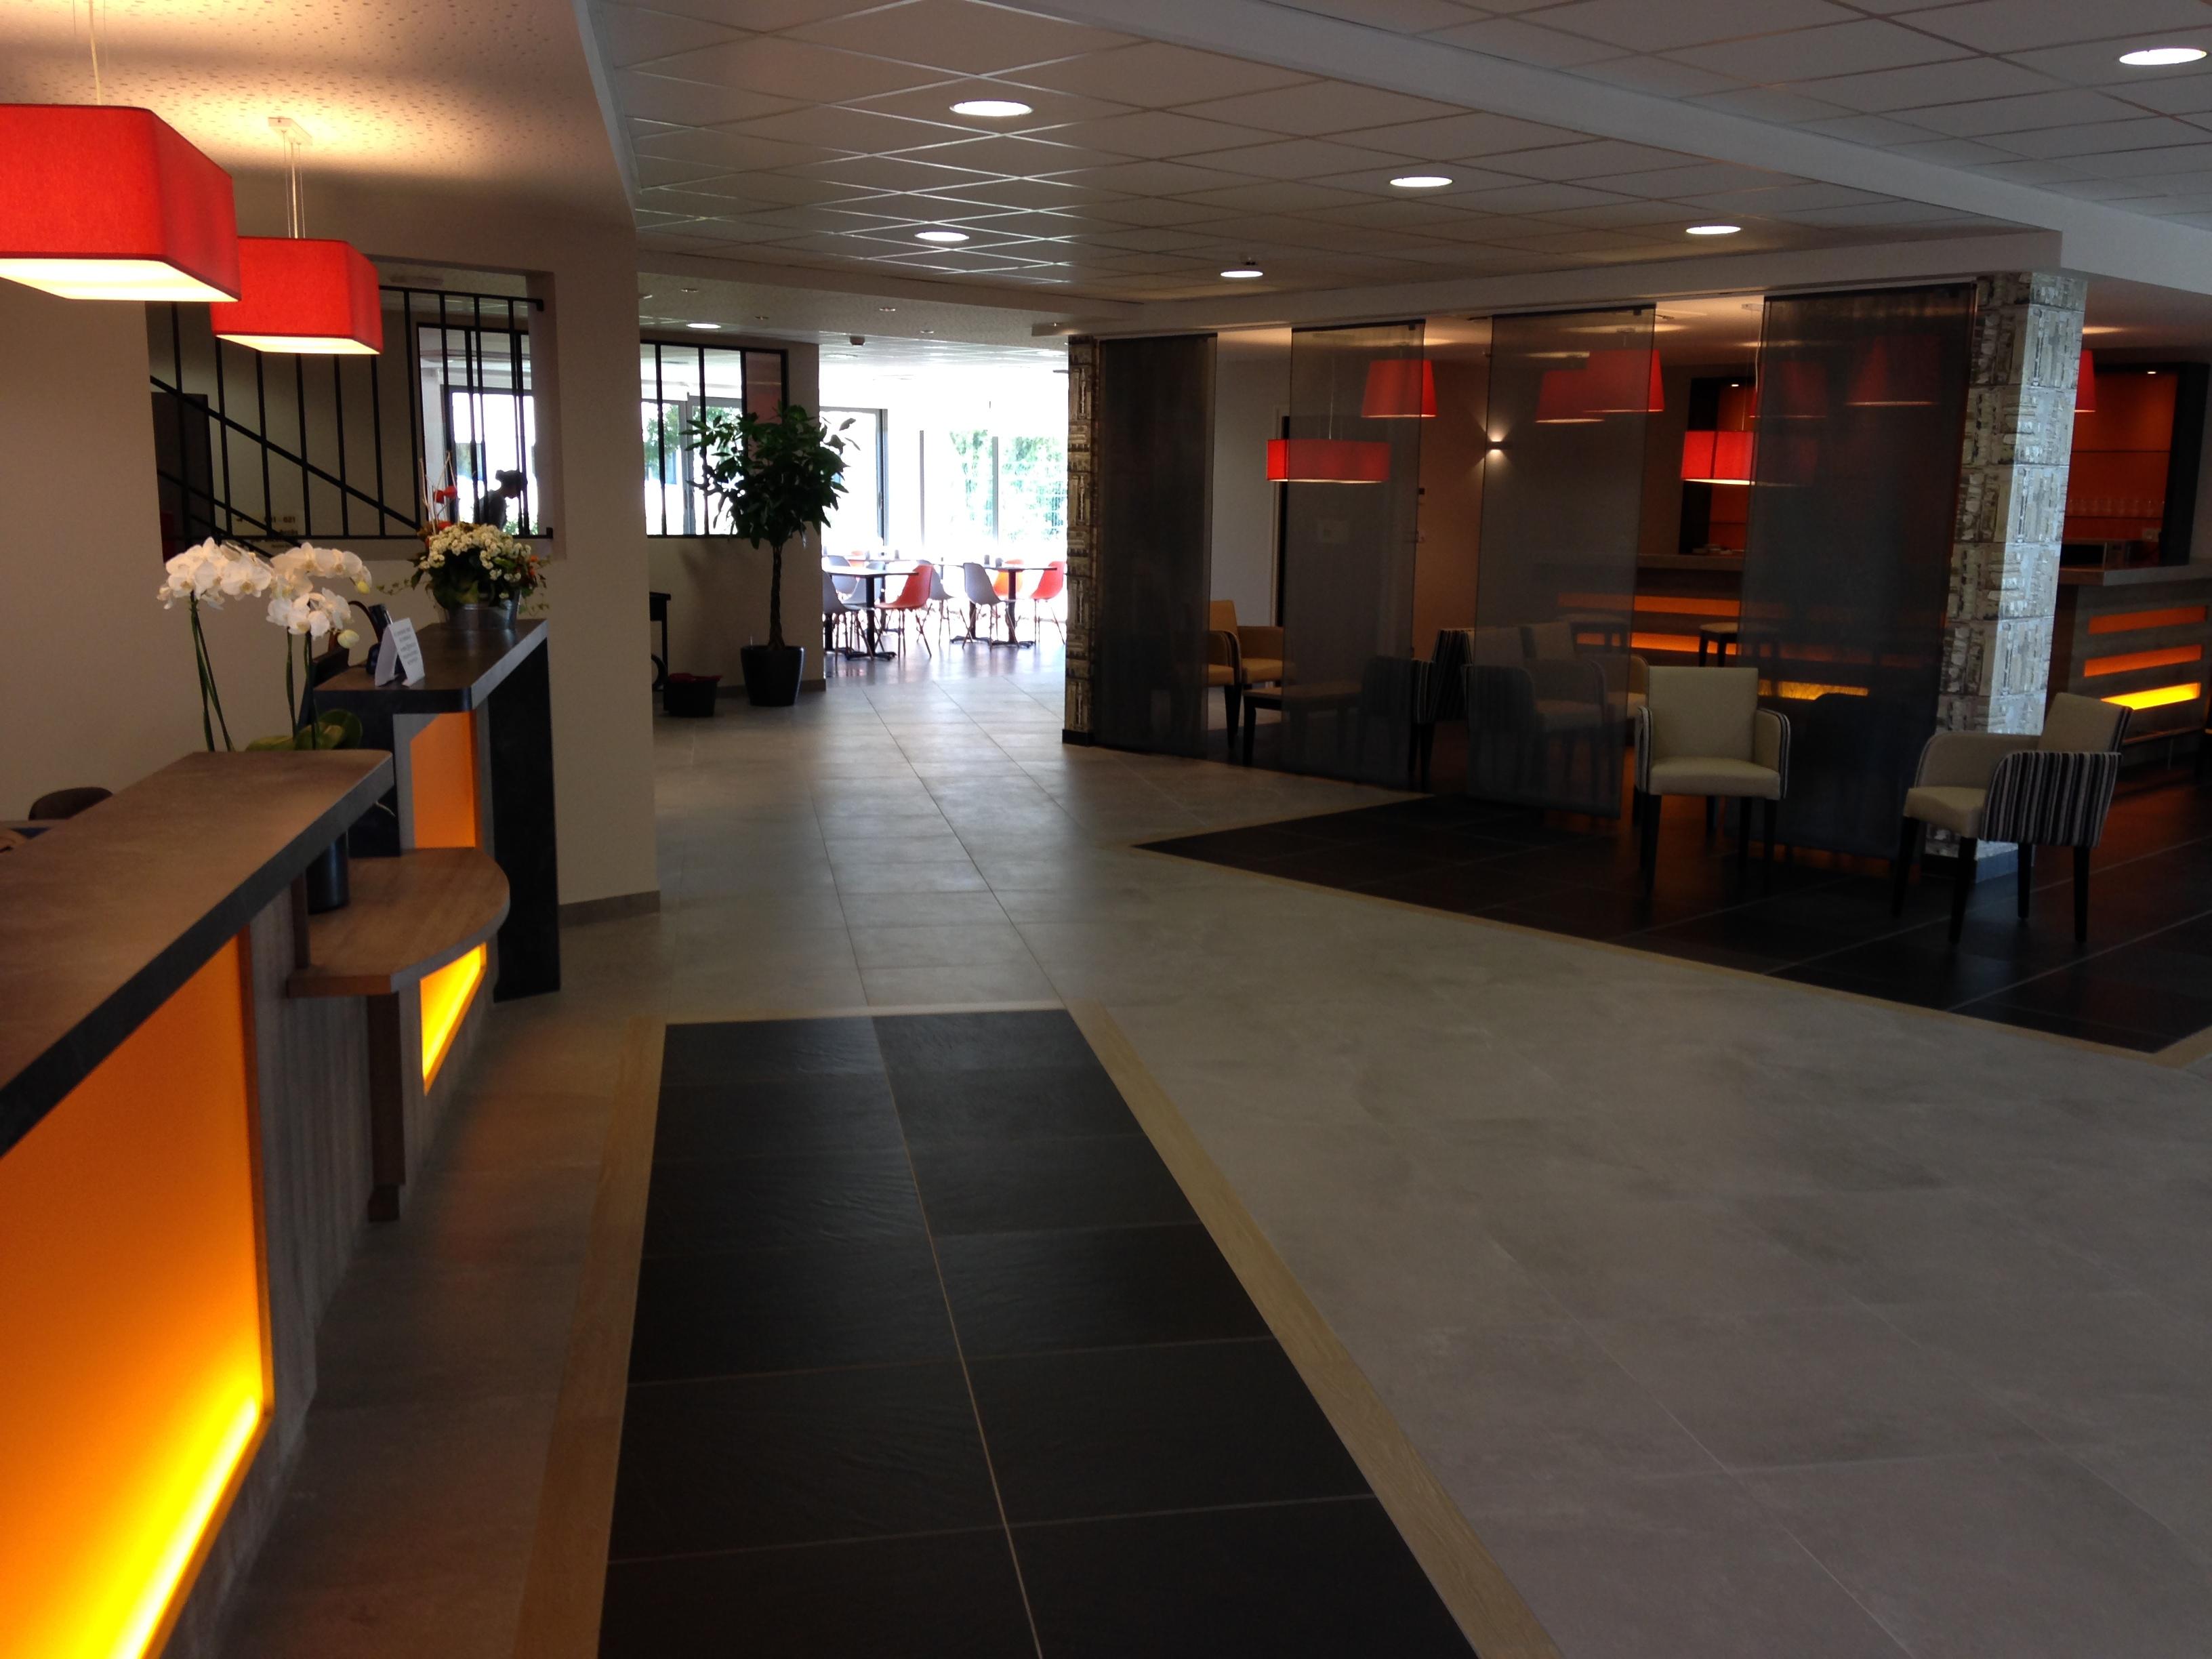 hotel kyriad angers beaucouze - géraldine fourny - decoratrice d interieur nantes 44 - réception 3